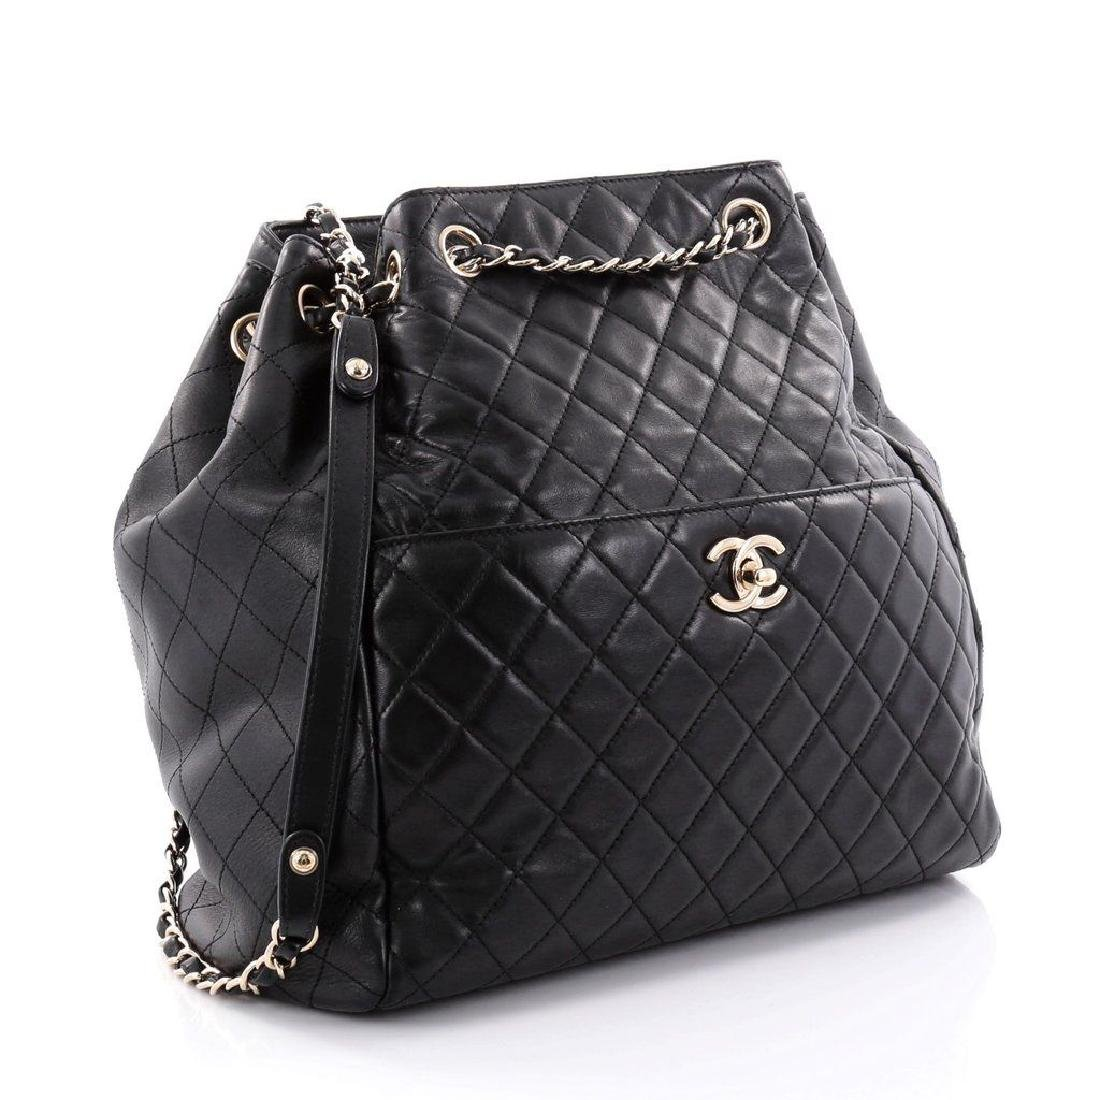 Chanel Lambskin Classic CC Drawstring Black Bucket Bag - 4